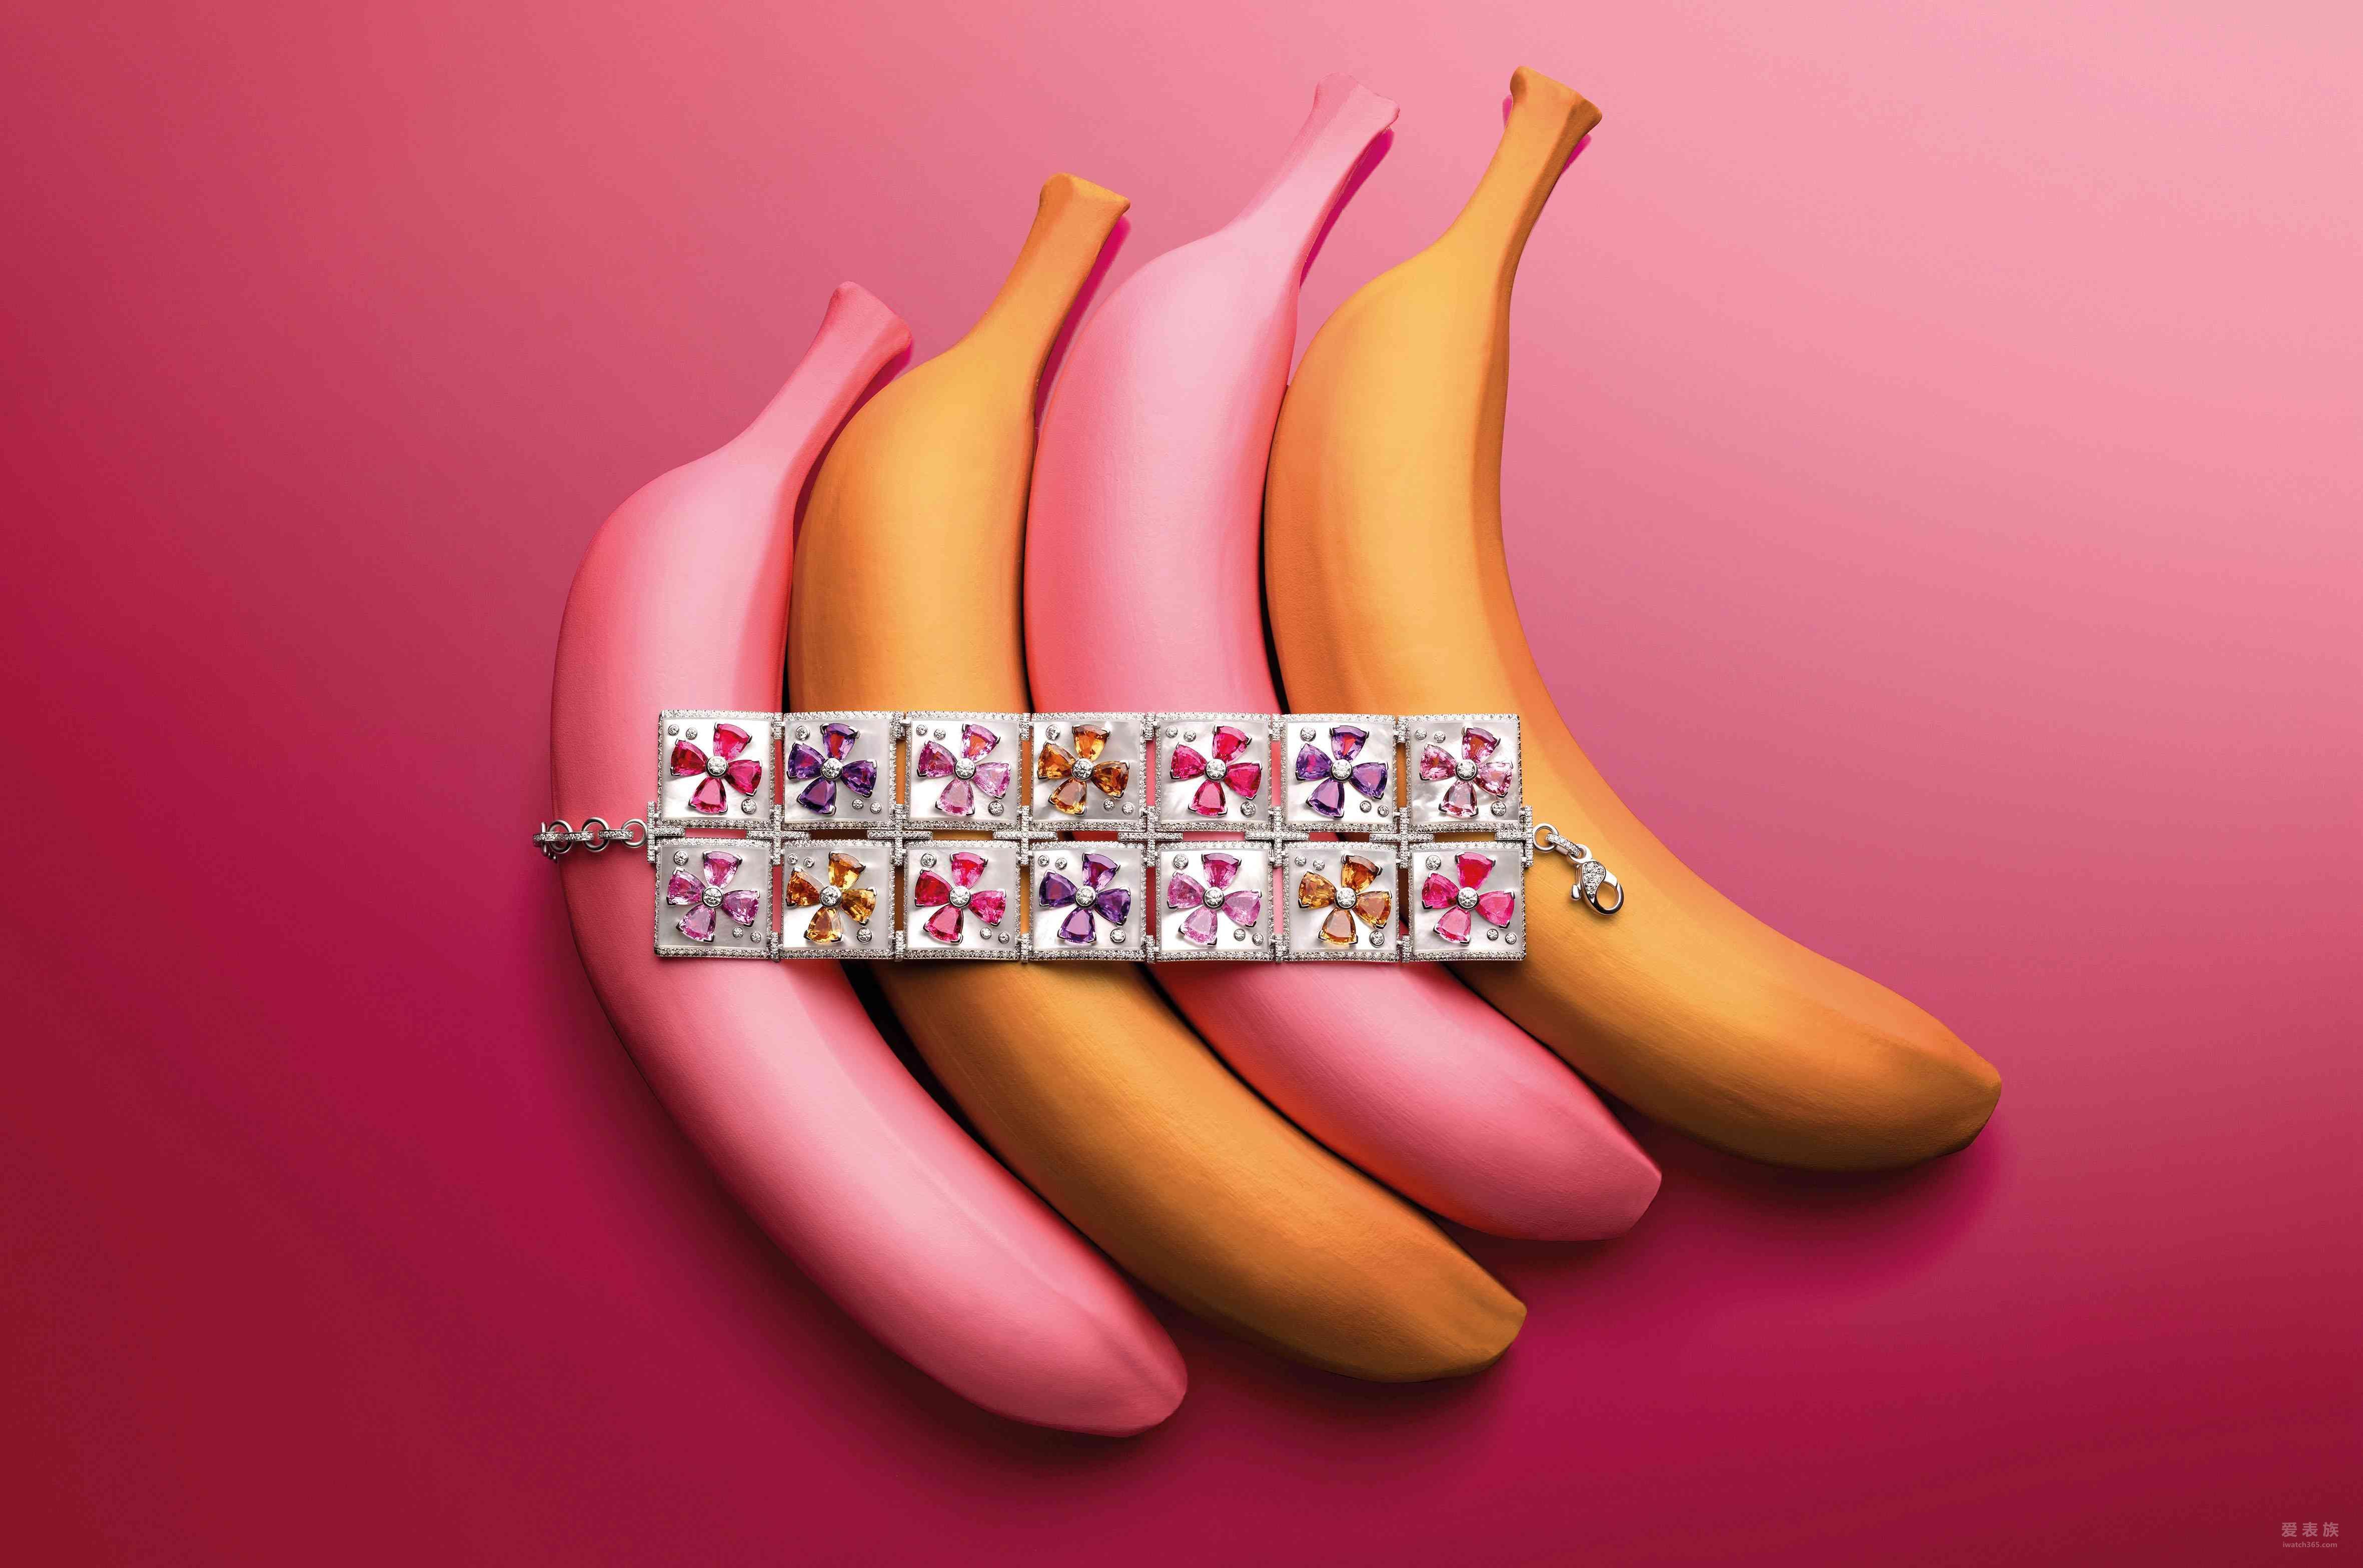 BVLGARI宝格丽Wild Pop高级珠宝系列将于北京璀璨亮相 带你闯入狂野80年代